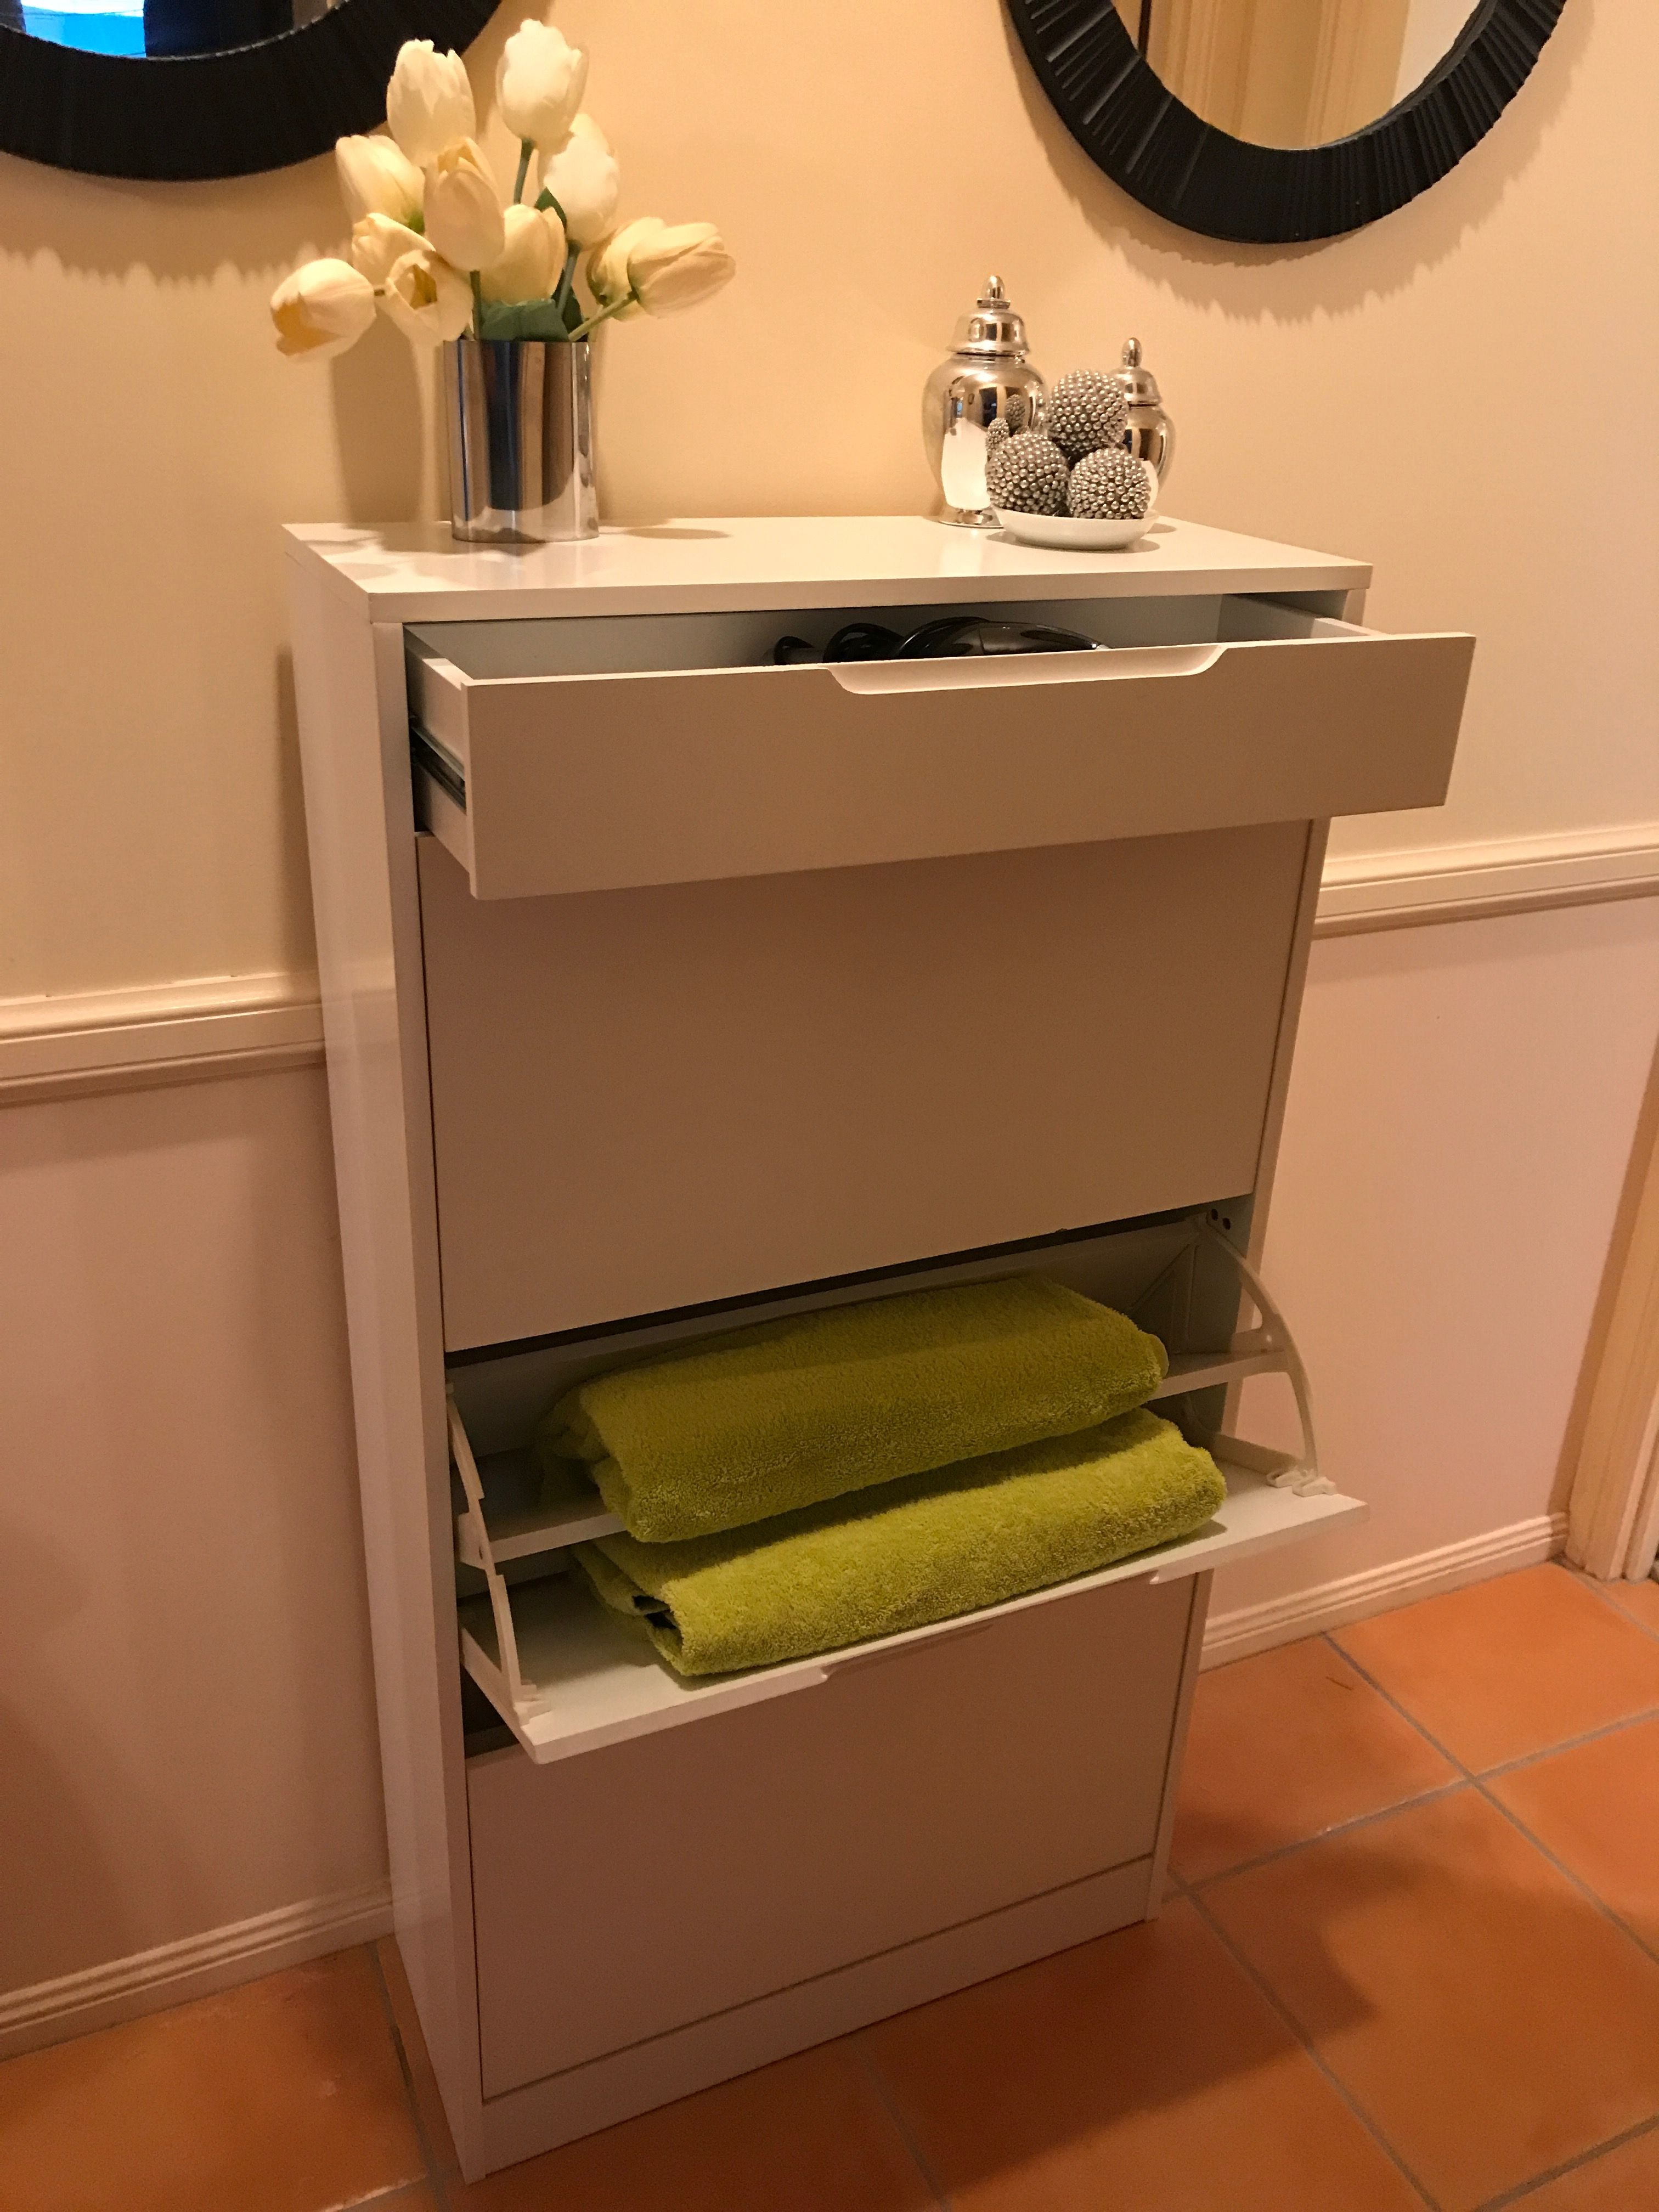 Kmart White Bathroom Cabinet